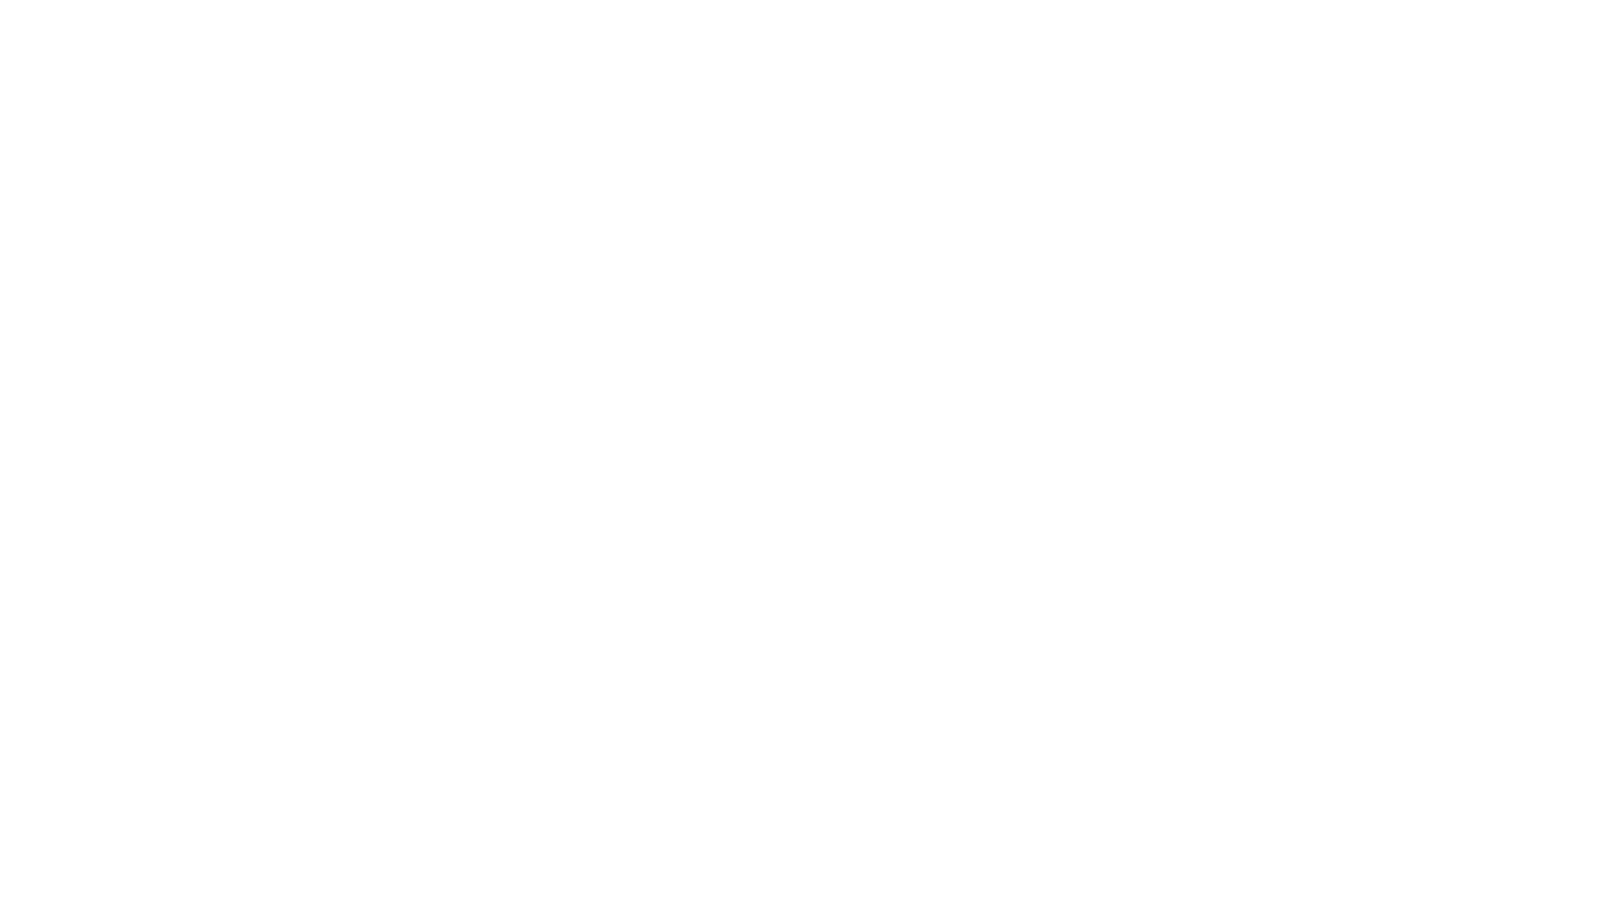 Preacher - Huw Willis Church Copyright Licence - 303452 Church Video Licence - 1146632 PRS for Music Church Licence - 1149639 Streaming License - 44235  #Hoylake #Meols #WestKirby #Wirral #HoylakeEvangelicalChurch #Resurrection #BiblePreaching #Gospel #Jesus #Sermon